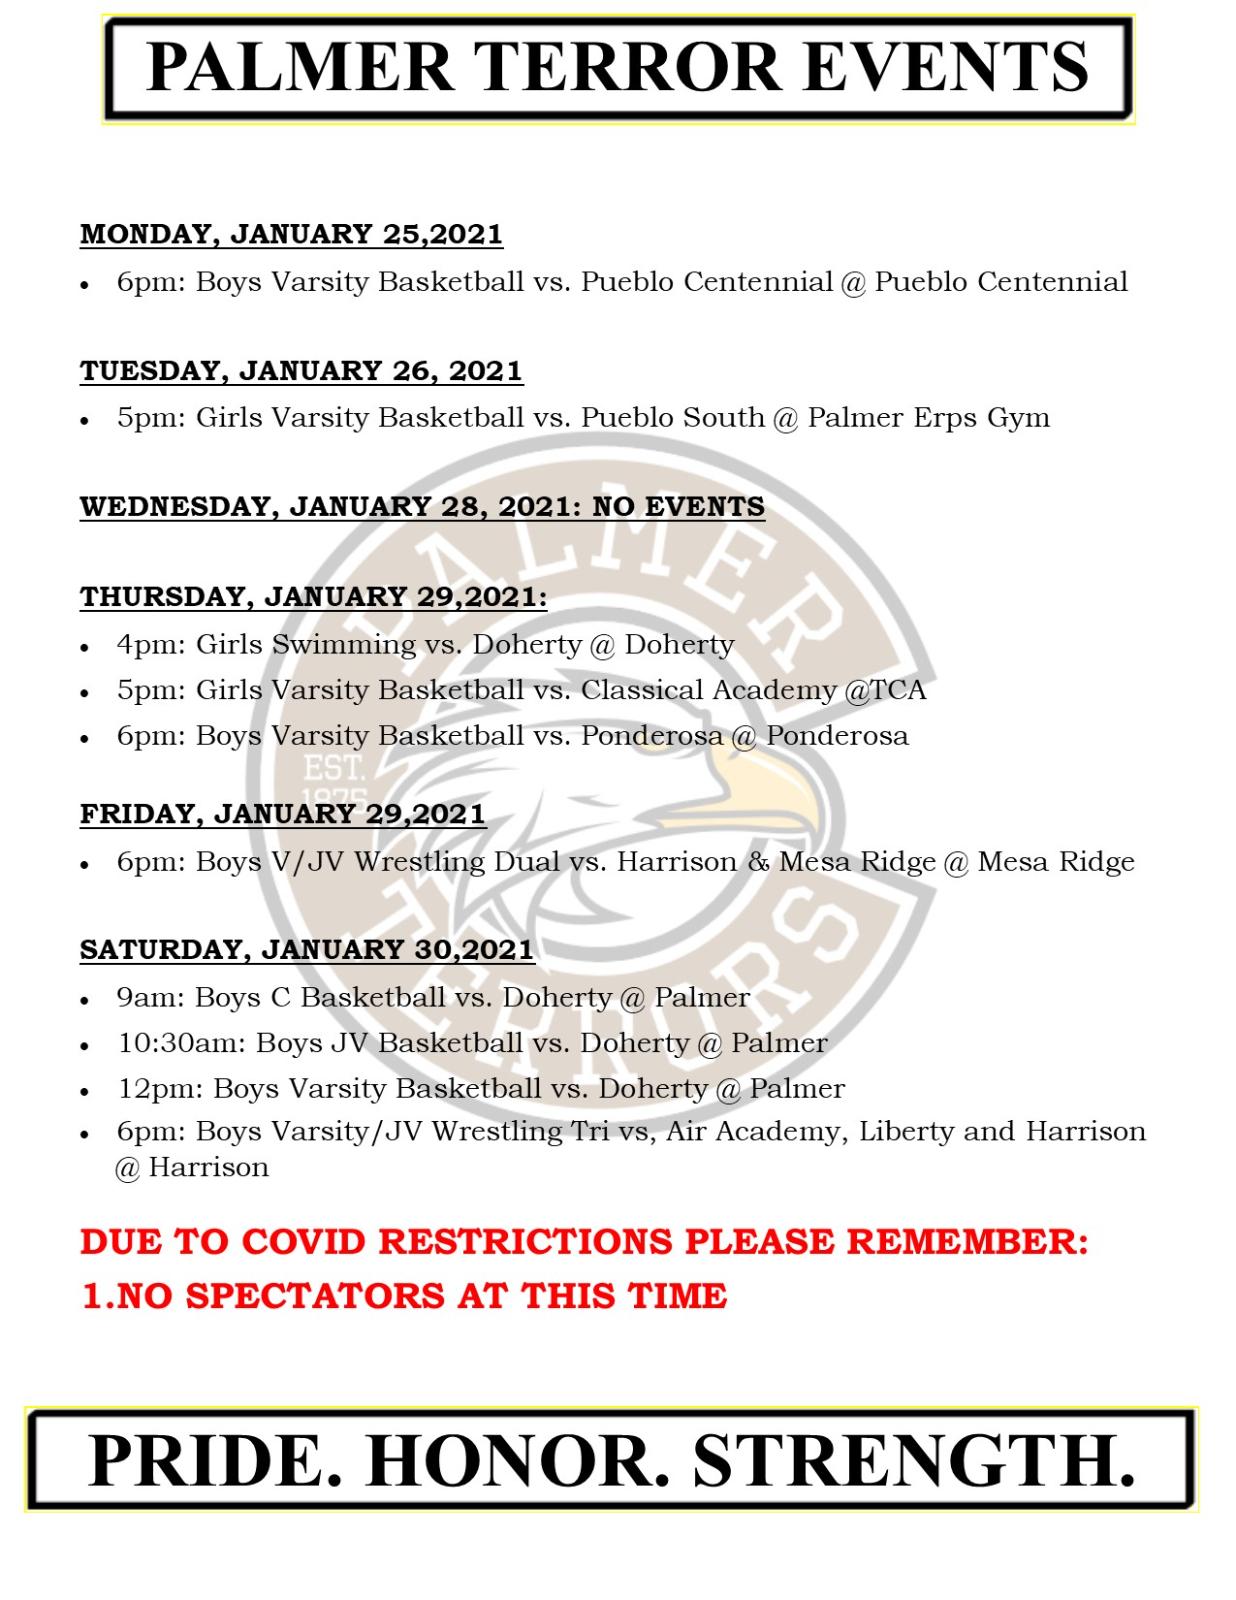 Palmer Events: January 25 – 30, 2021